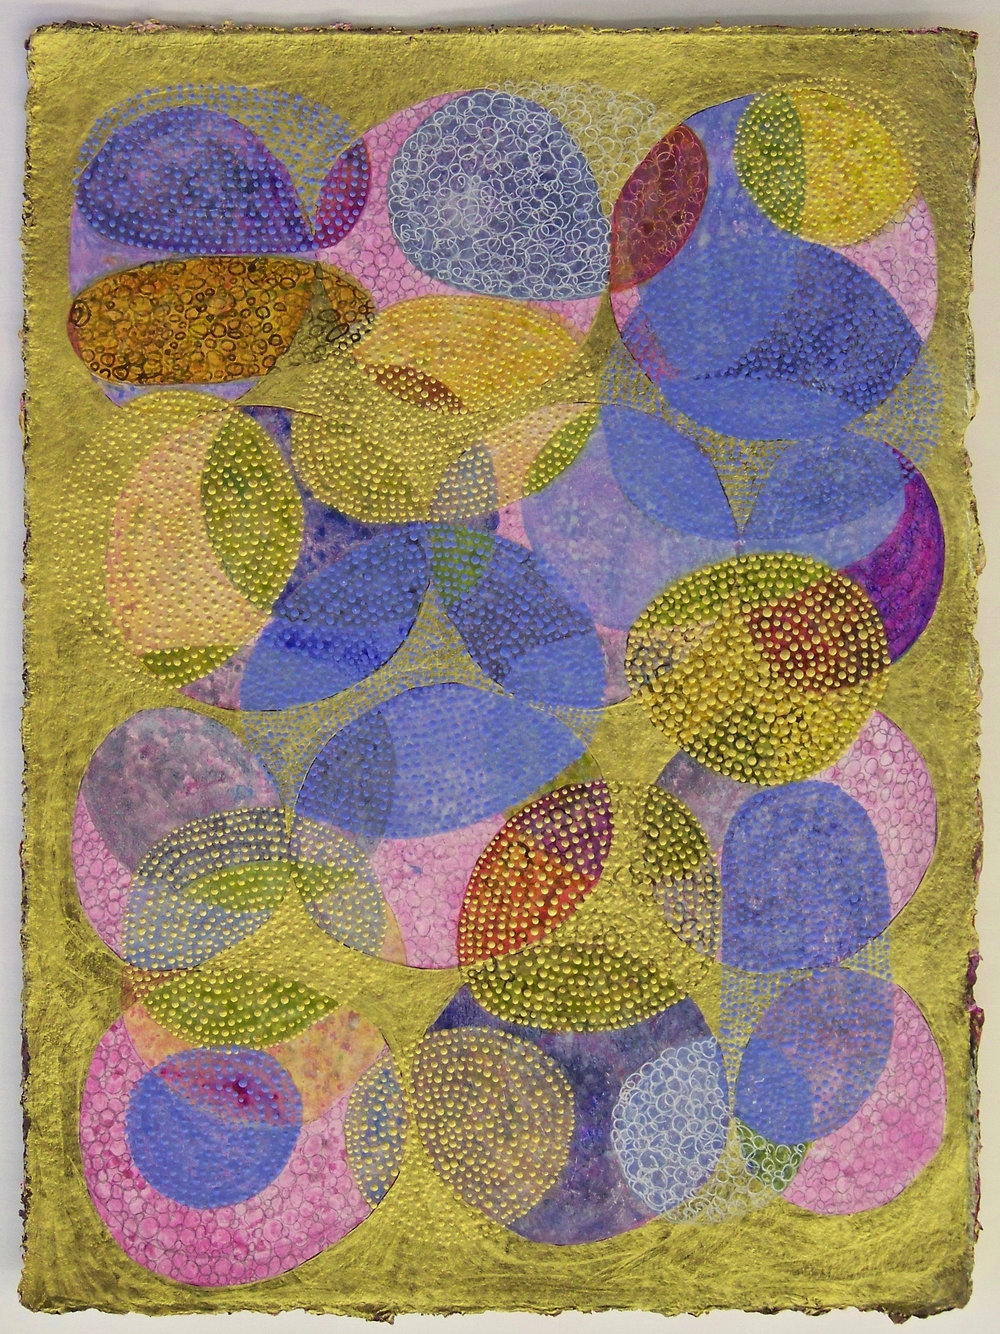 D. Driscoll,  Inner Garden 04 , acrylic on paper, 16x12